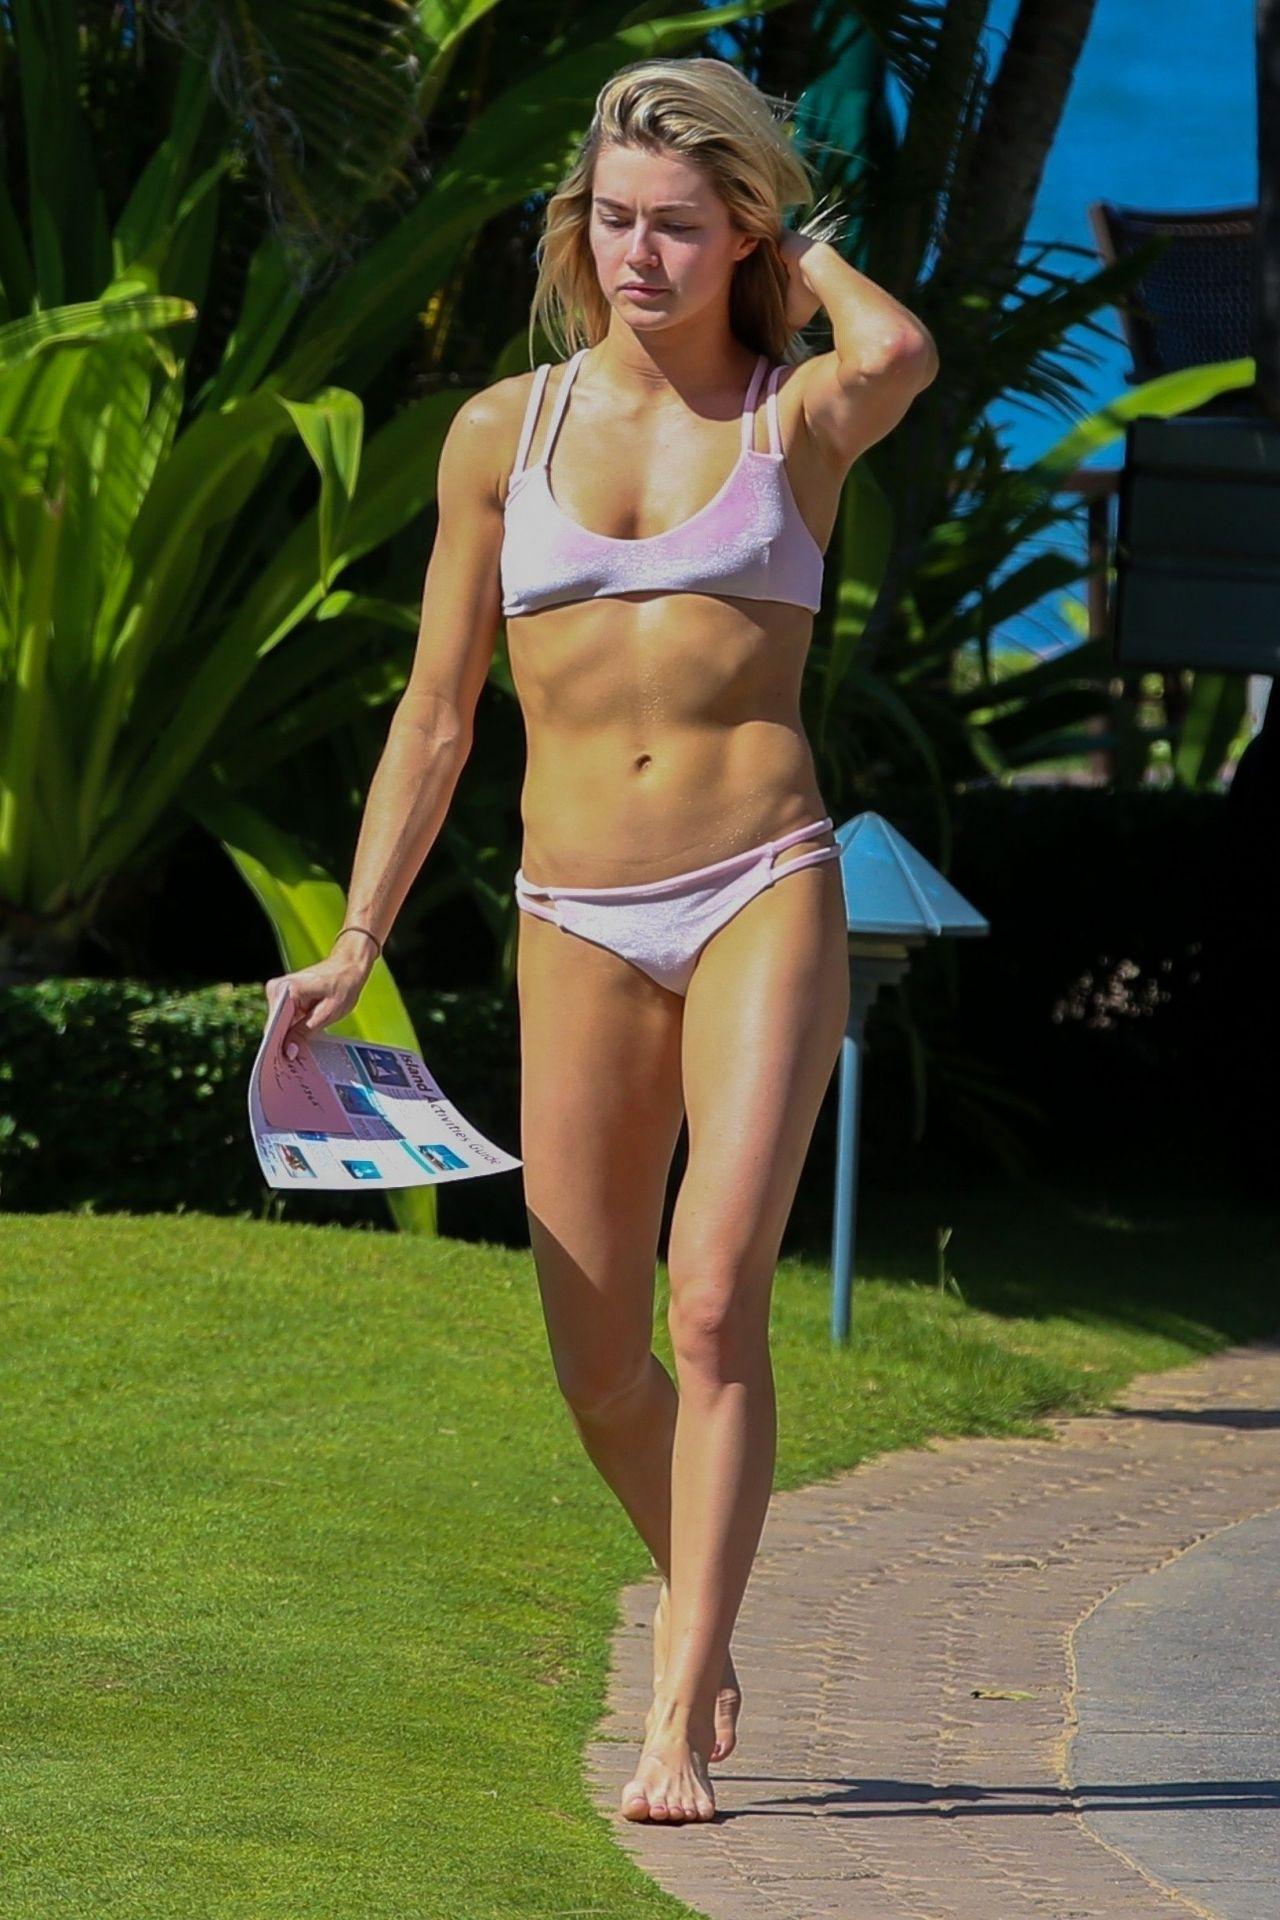 Bikini Lindsay Arnold Cusick naked (54 photos), Topless, Fappening, Instagram, in bikini 2019